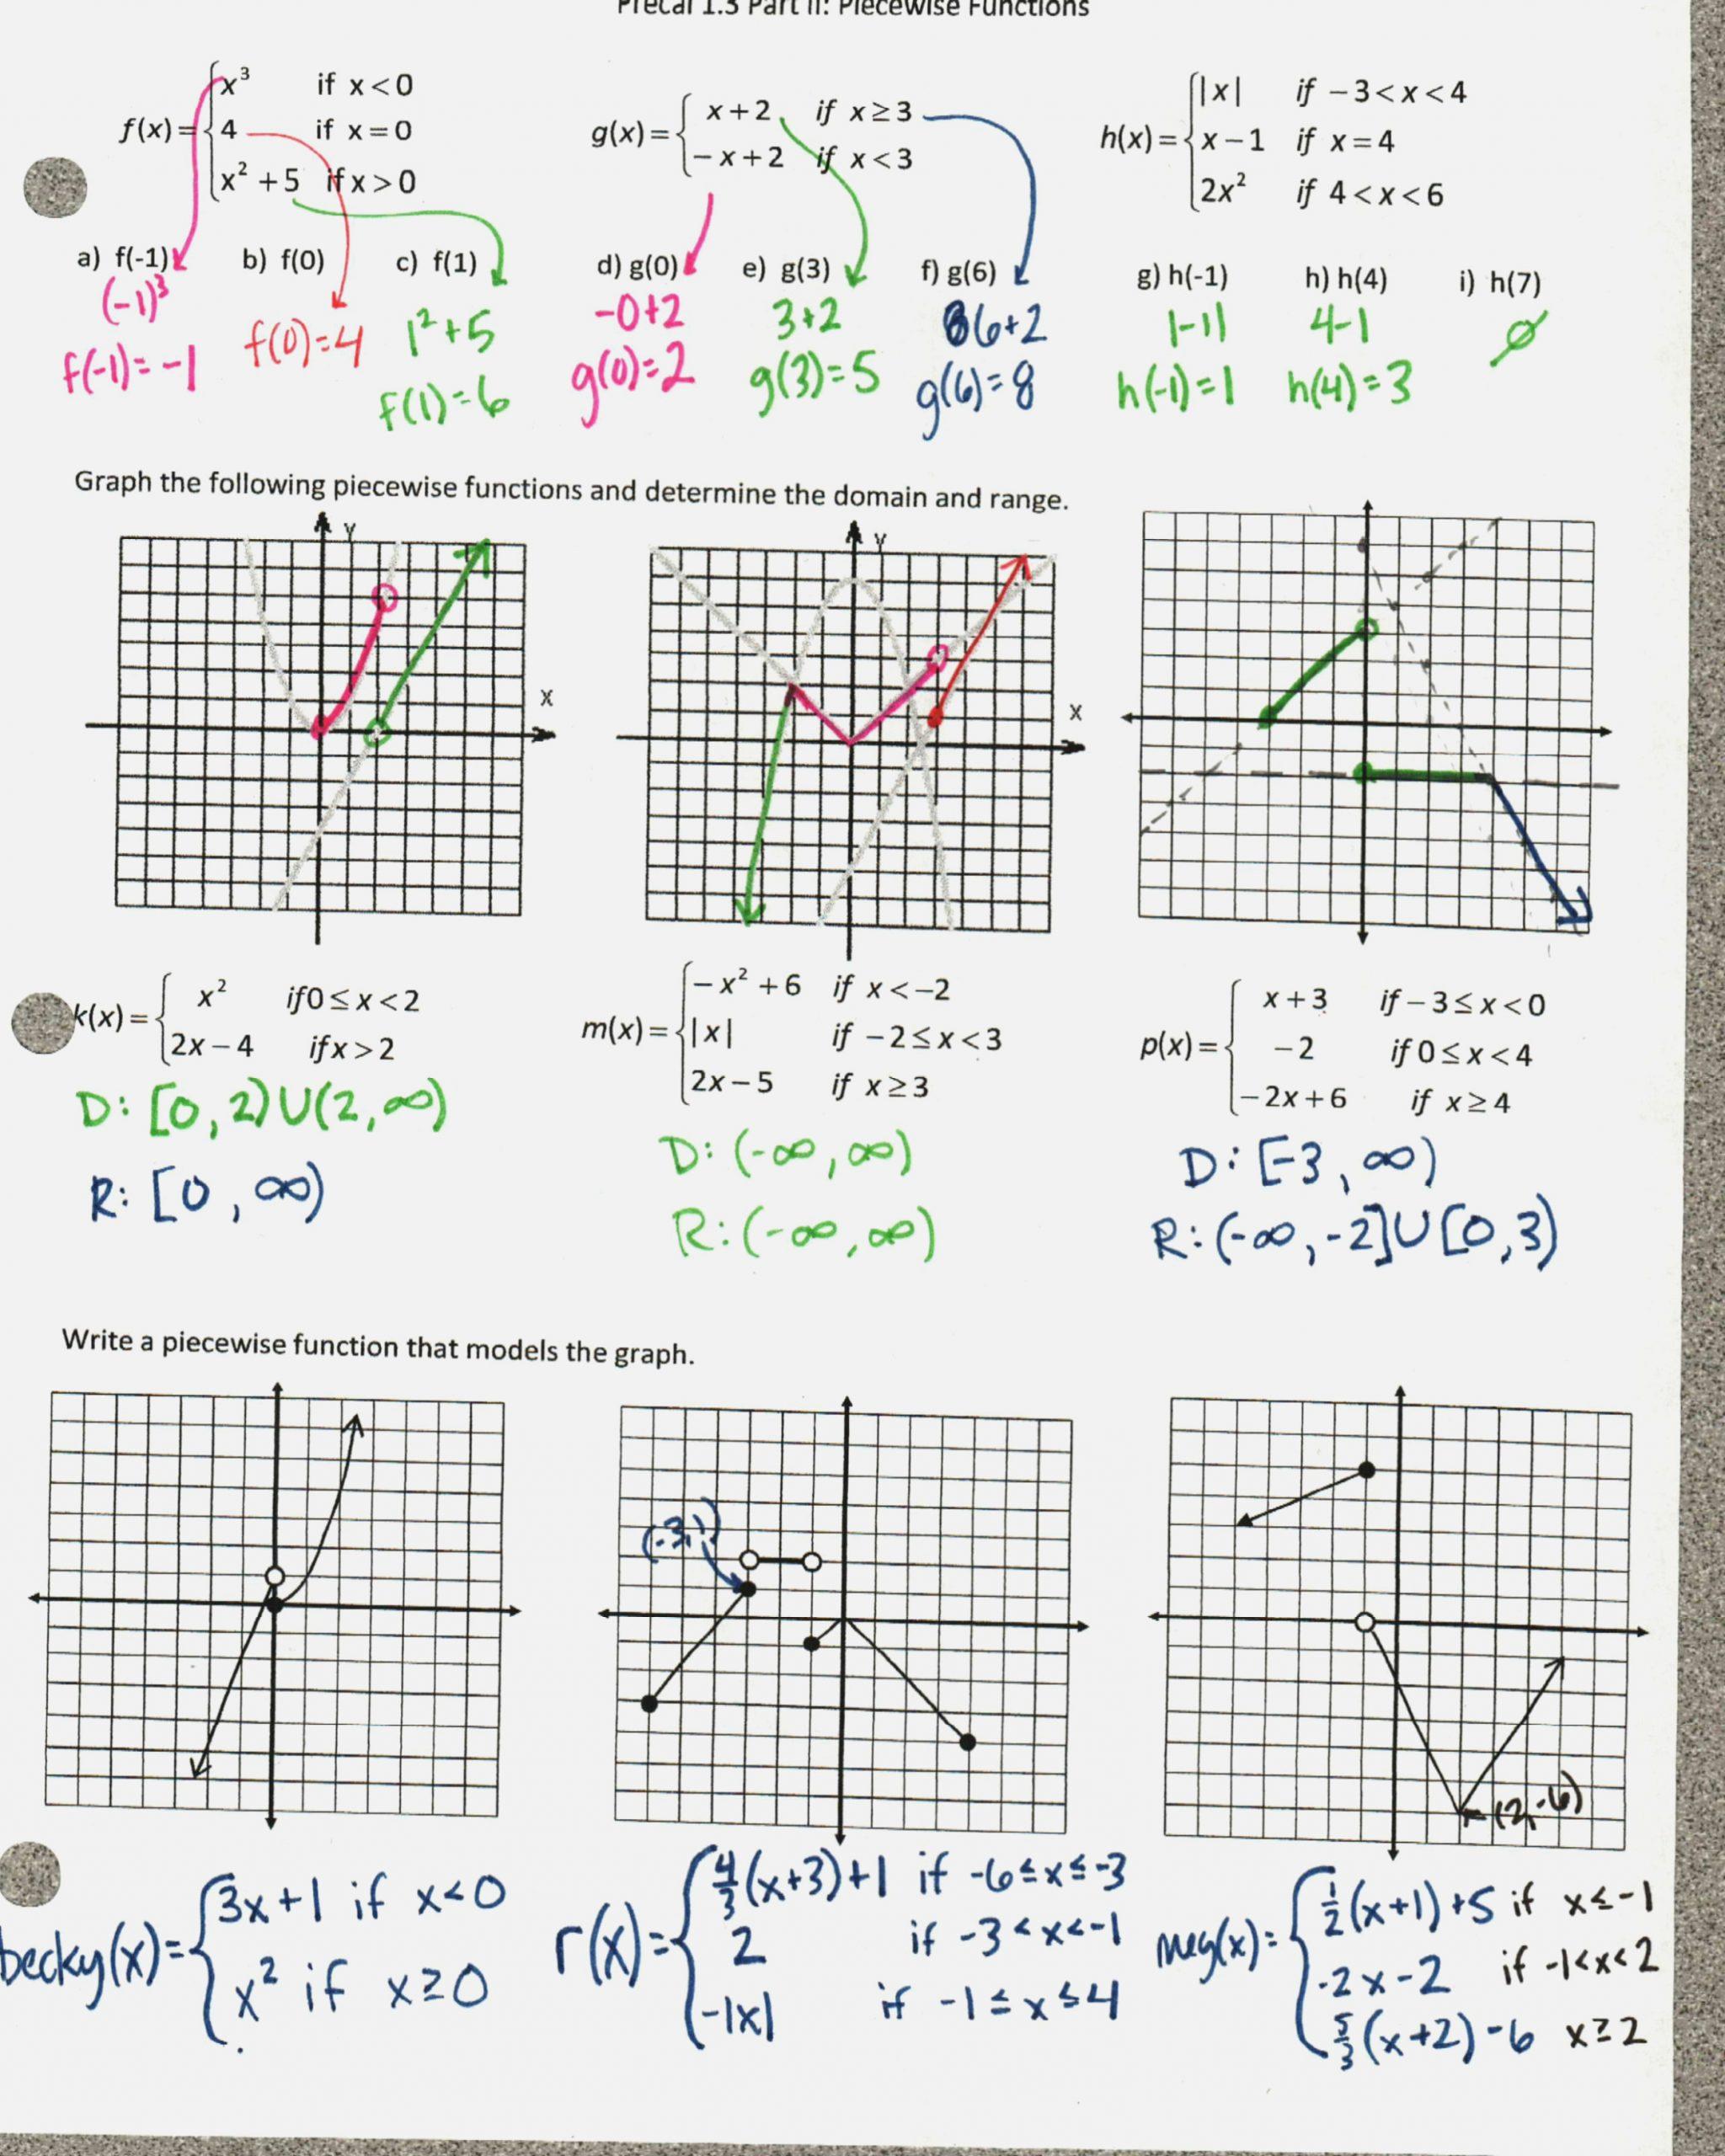 Graphing Trig Functions Practice Worksheet Graphing Cosine Functions Worksheet